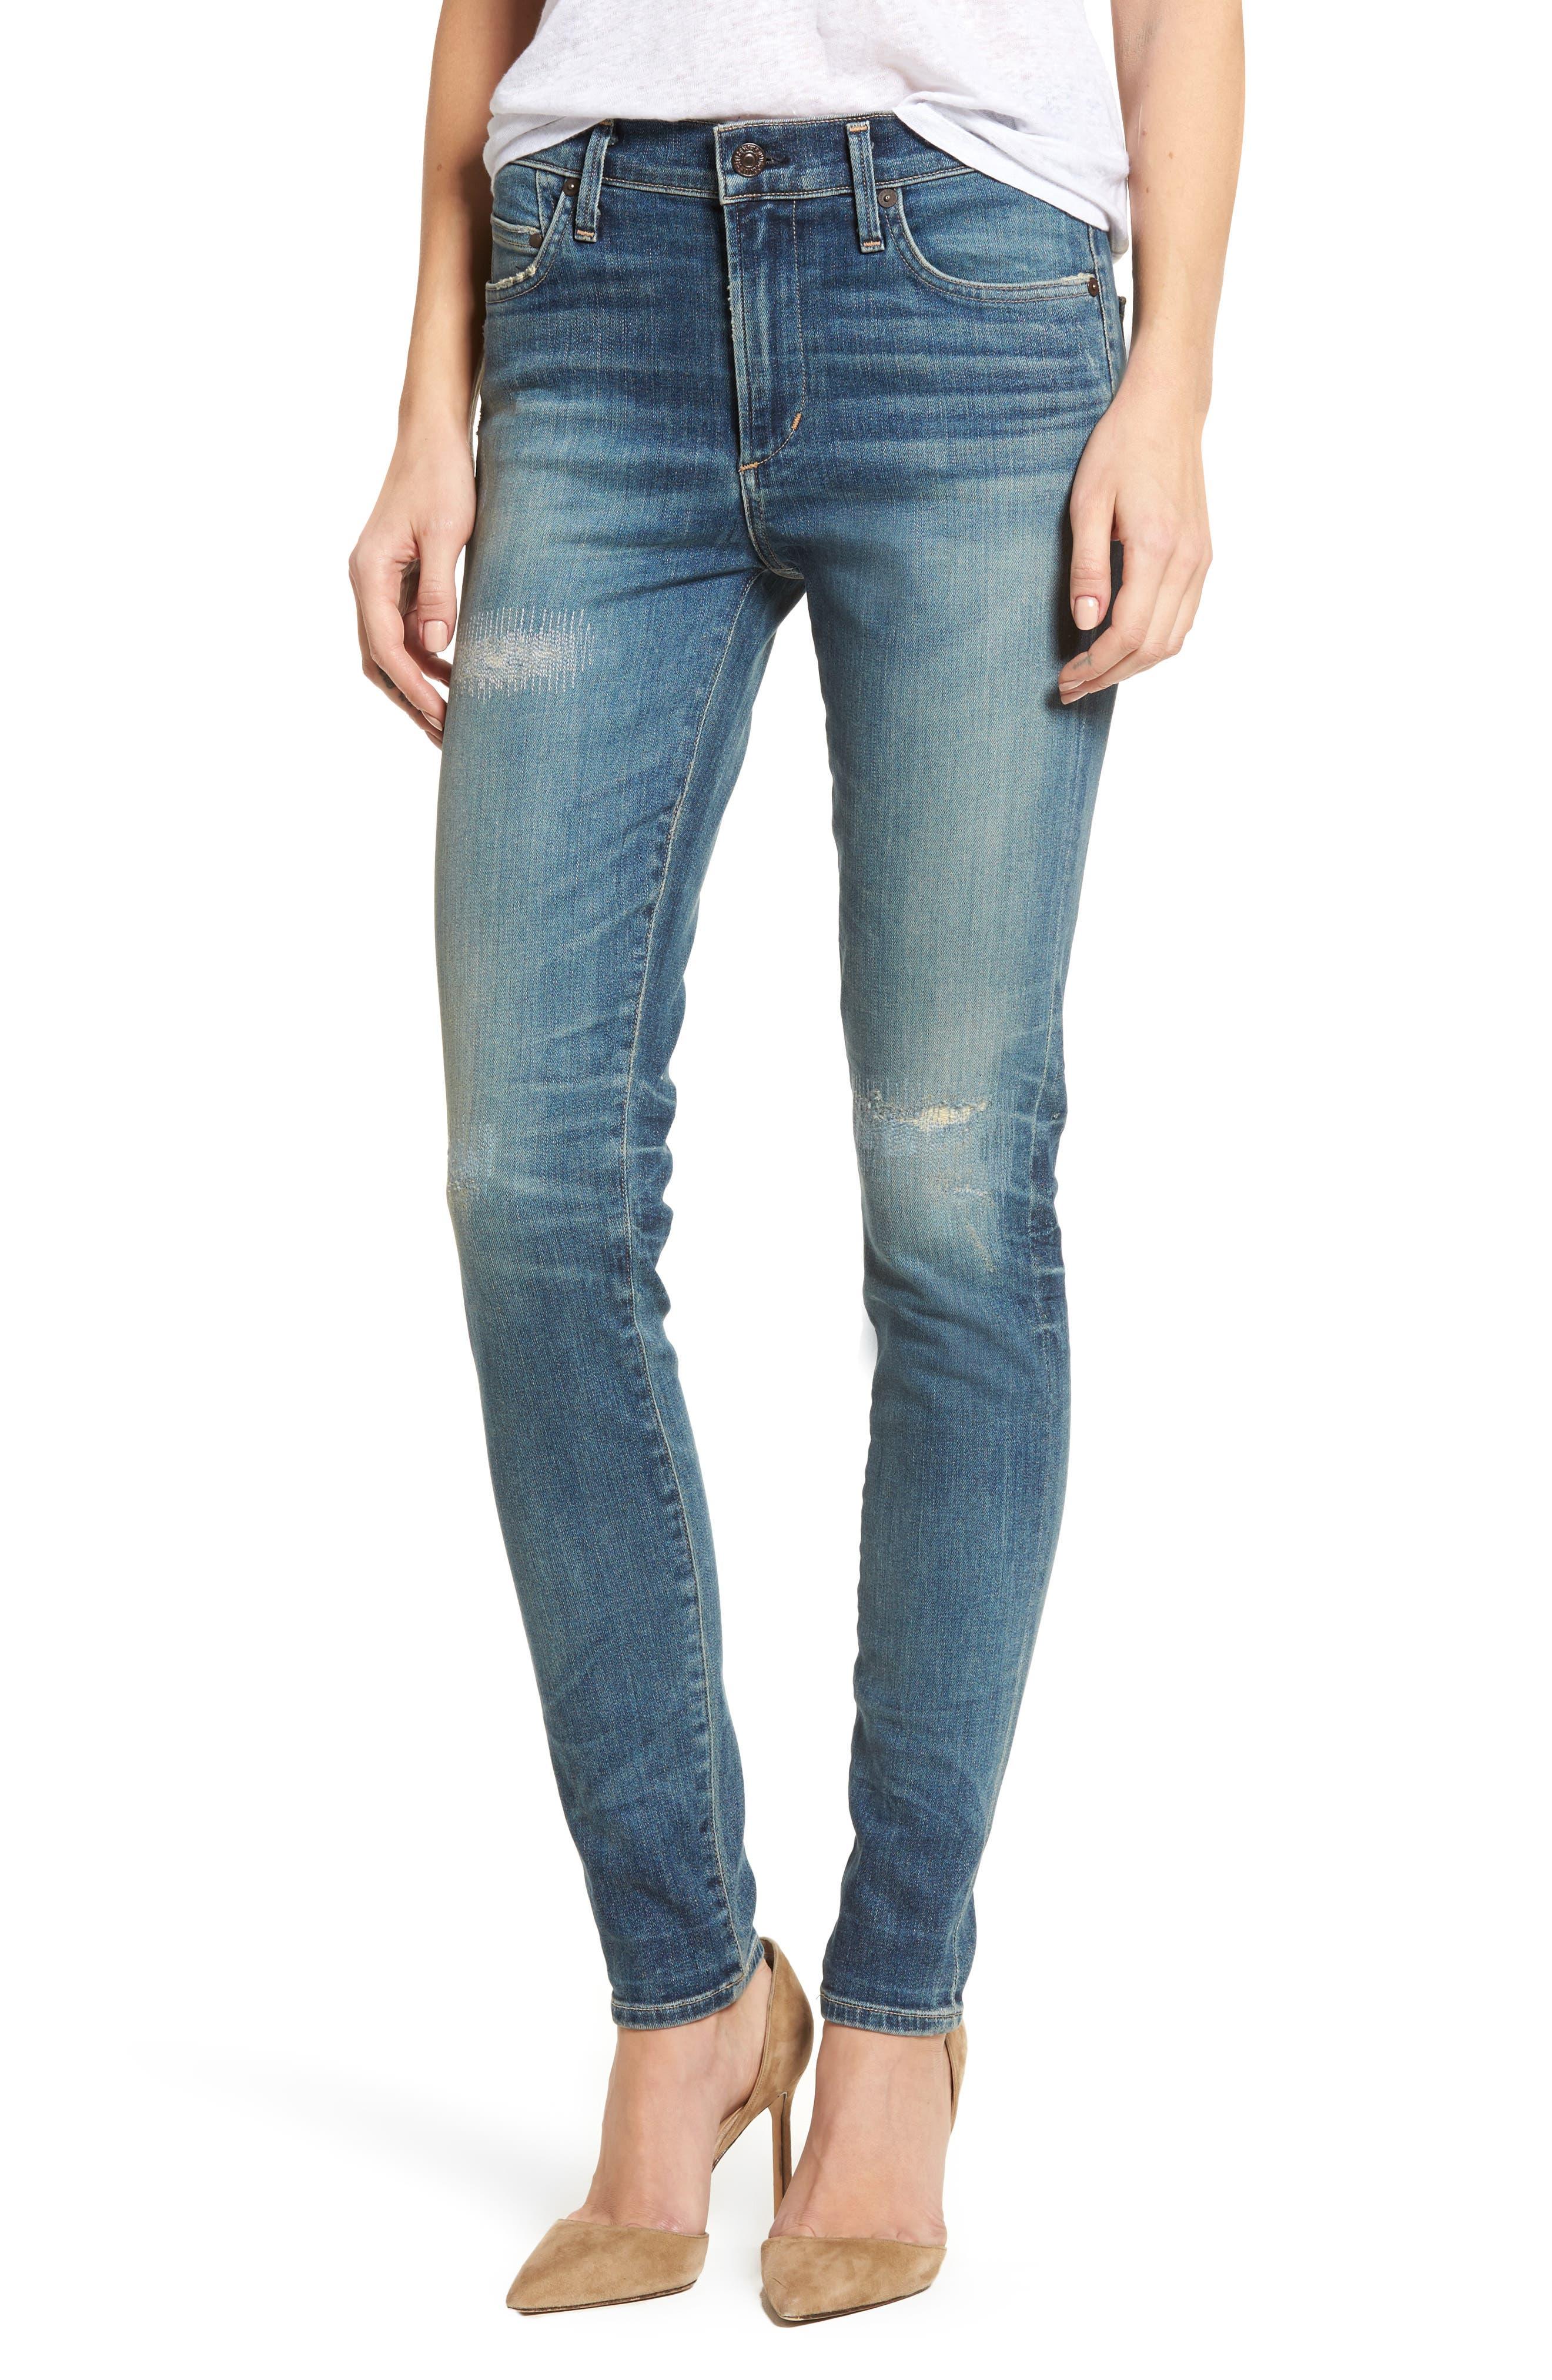 Rocket High Waist Skinny Jeans,                             Main thumbnail 1, color,                             465